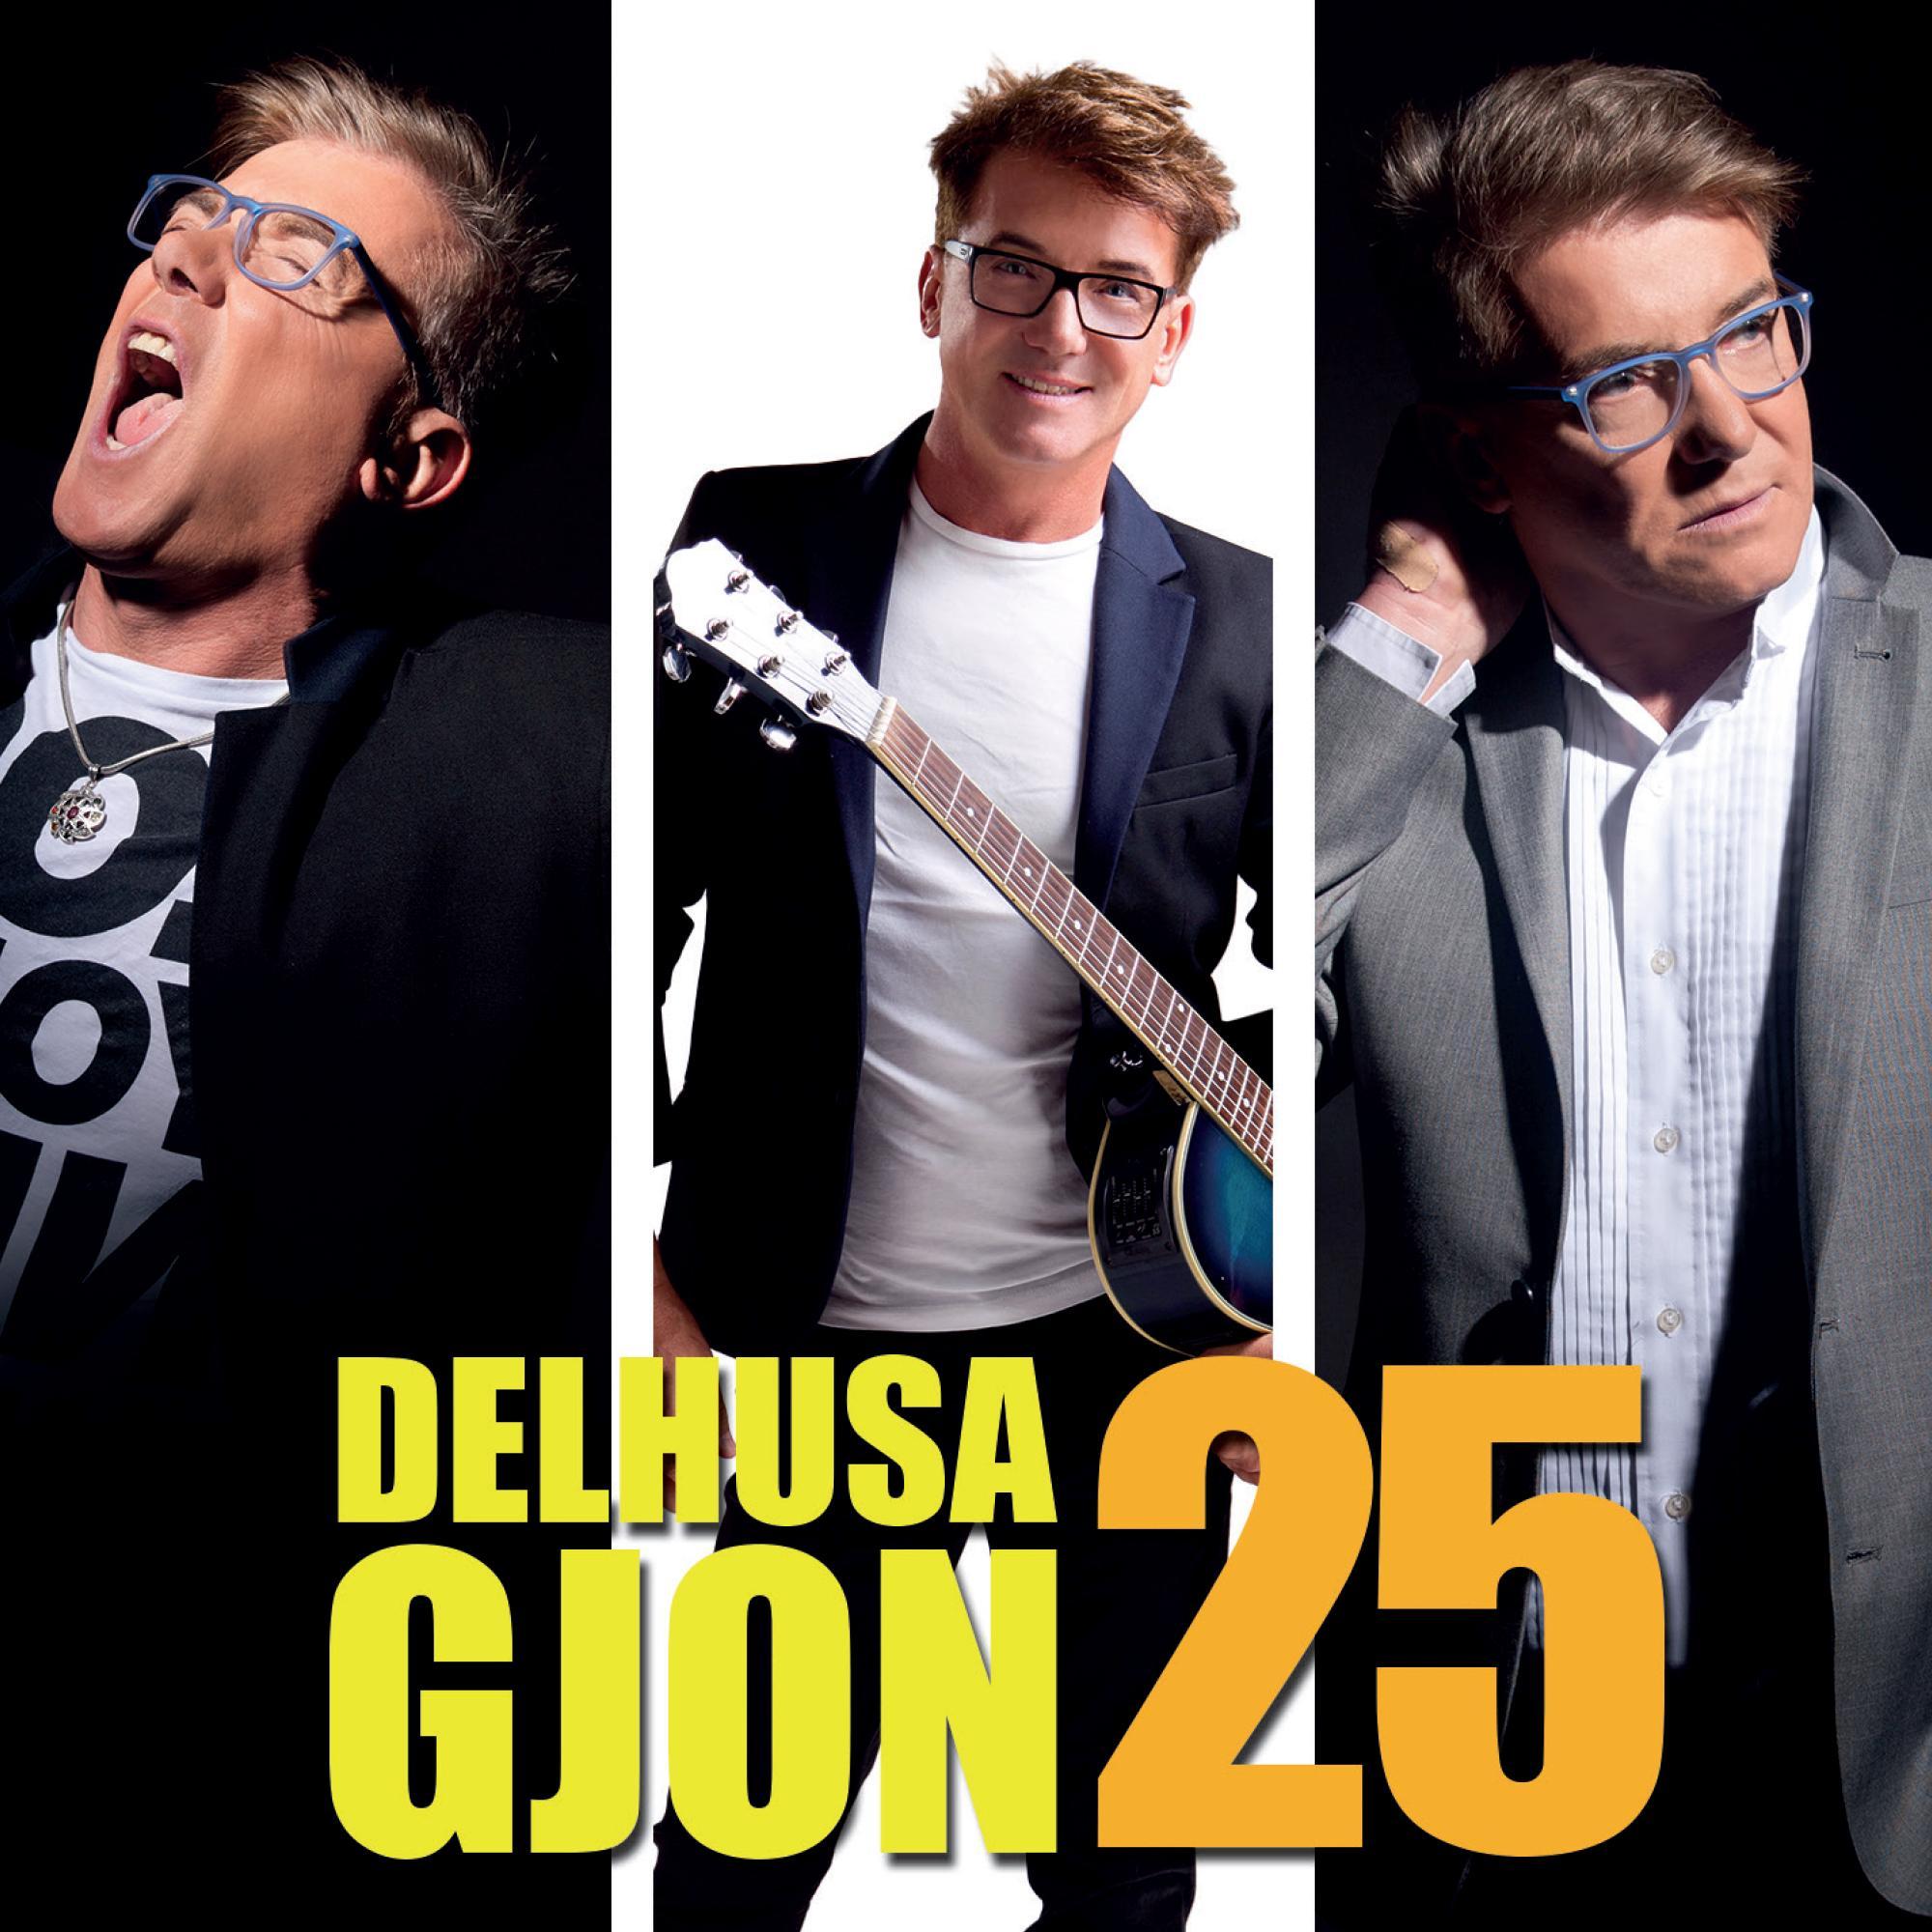 GJON, DELHUSA - DELHUSA GJON 25 - CD -